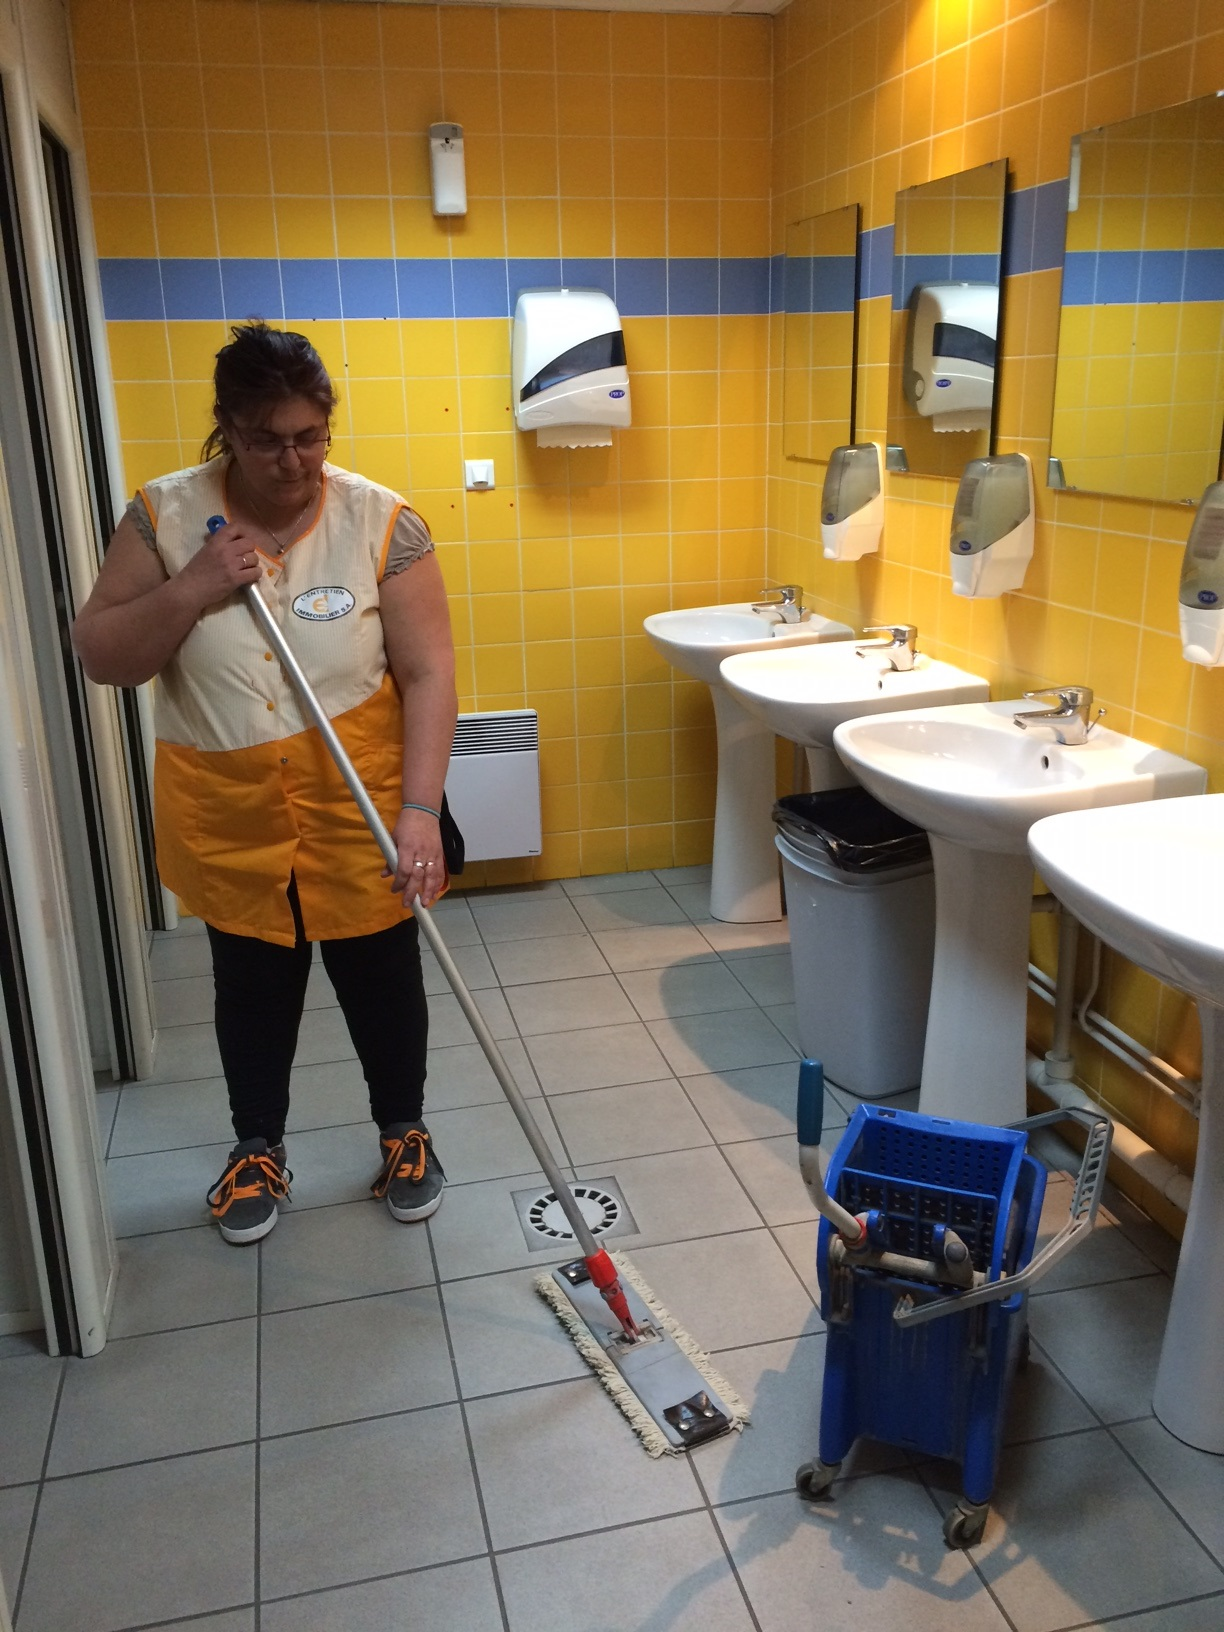 maf elec wc